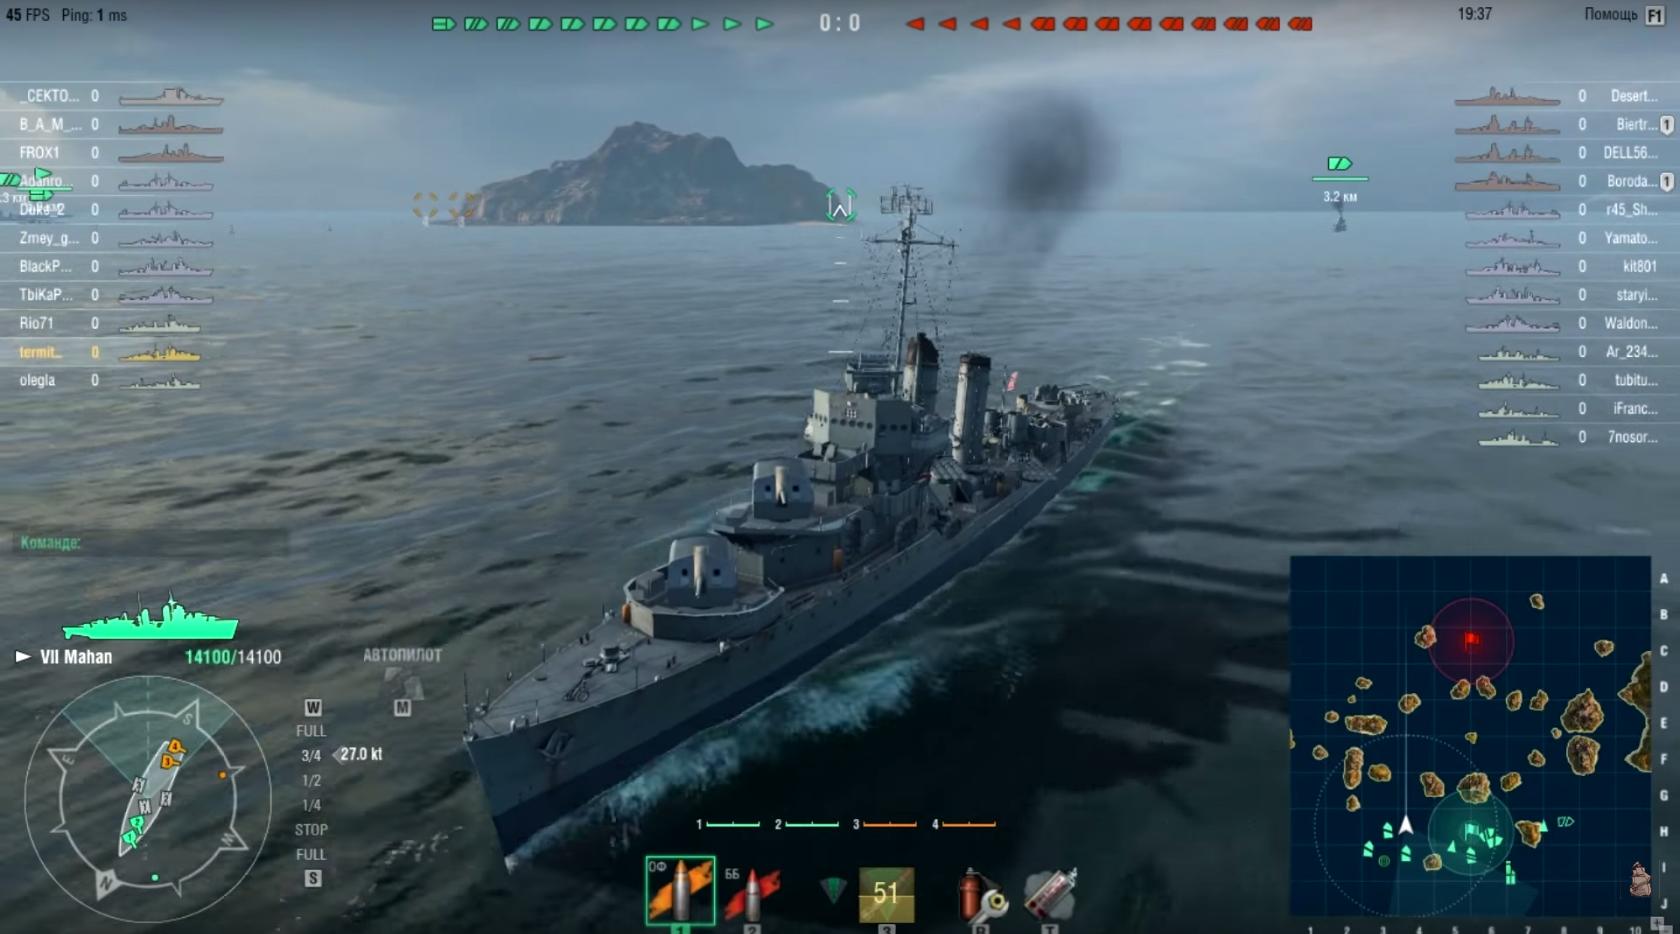 Гайд по американскому эсминцу Mahan из World of Warships